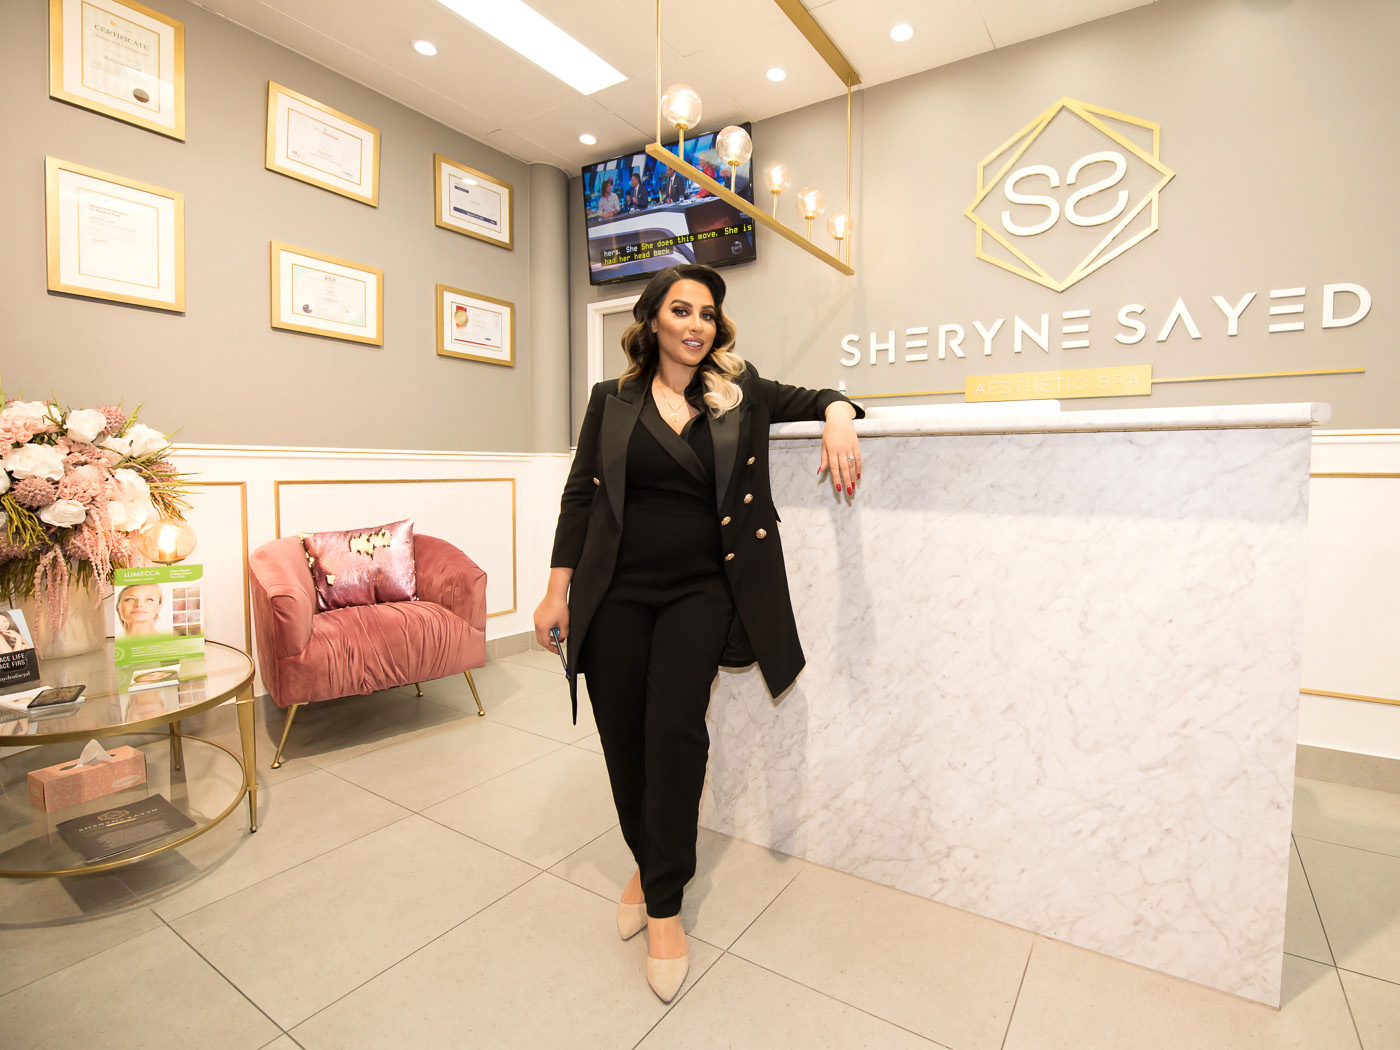 Sheryne Sayed Aesthetic Spa